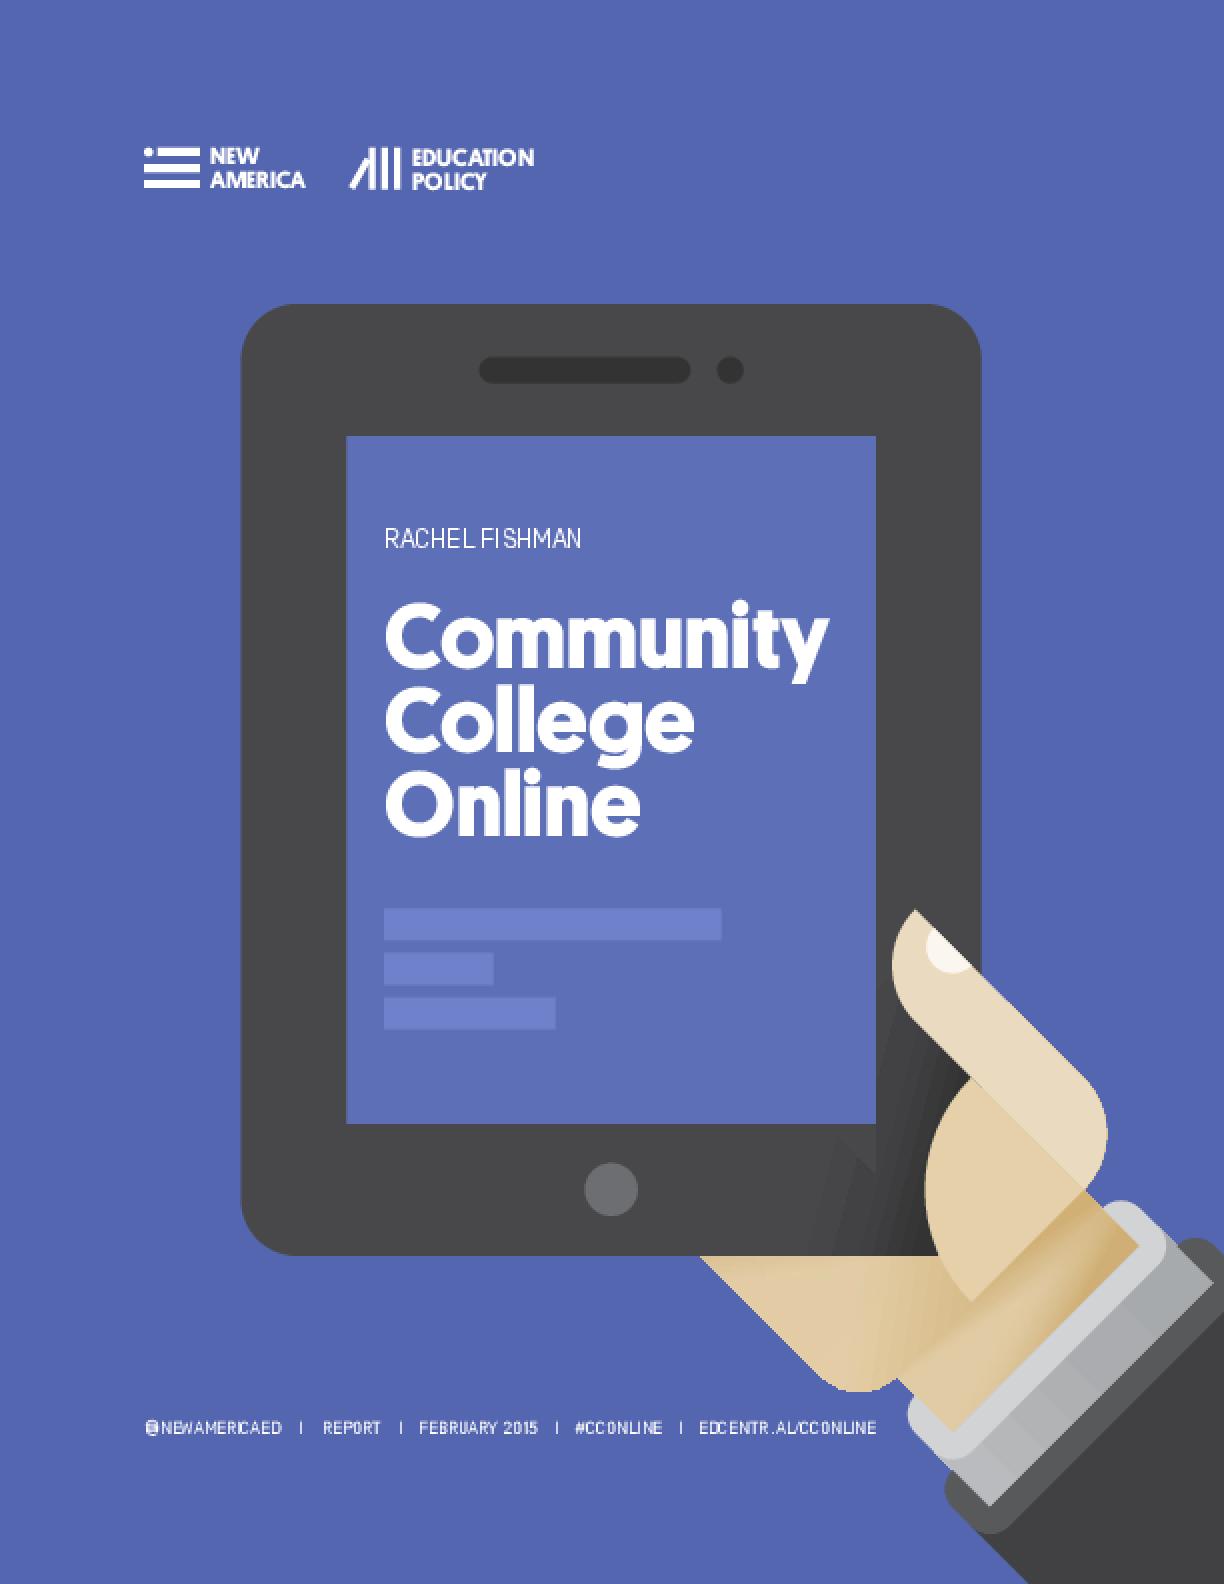 Community College Online